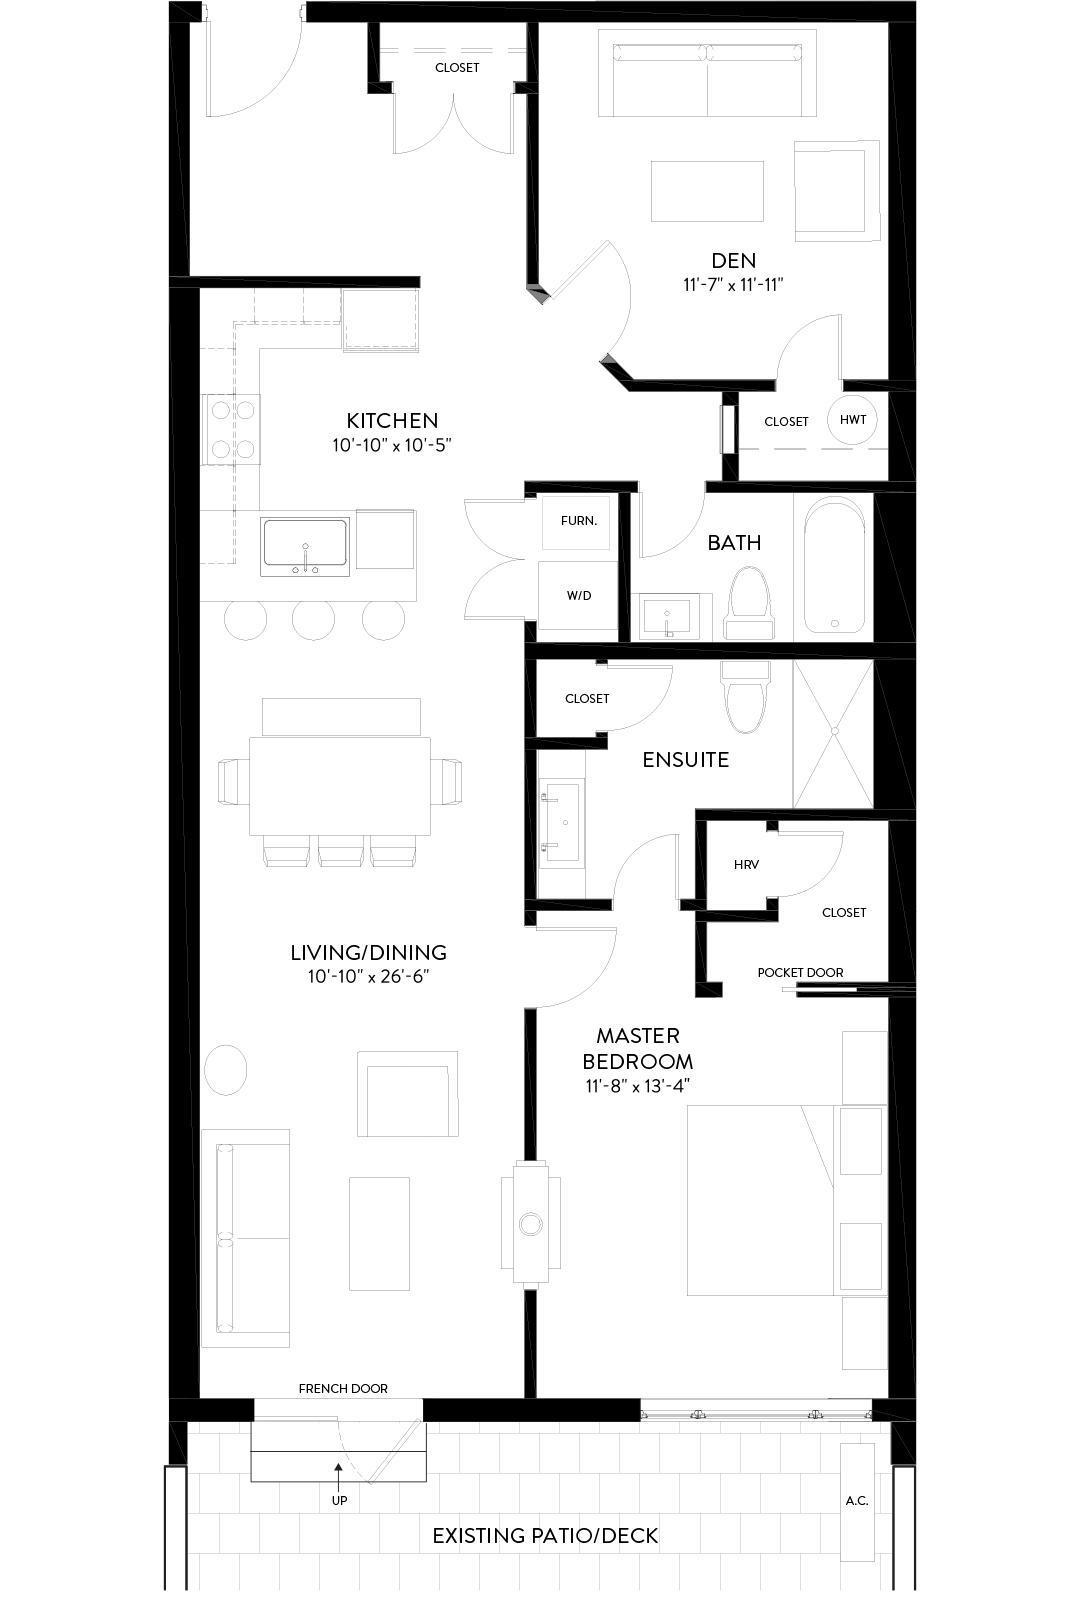 Slopeside Birchgrove Floorplans Image